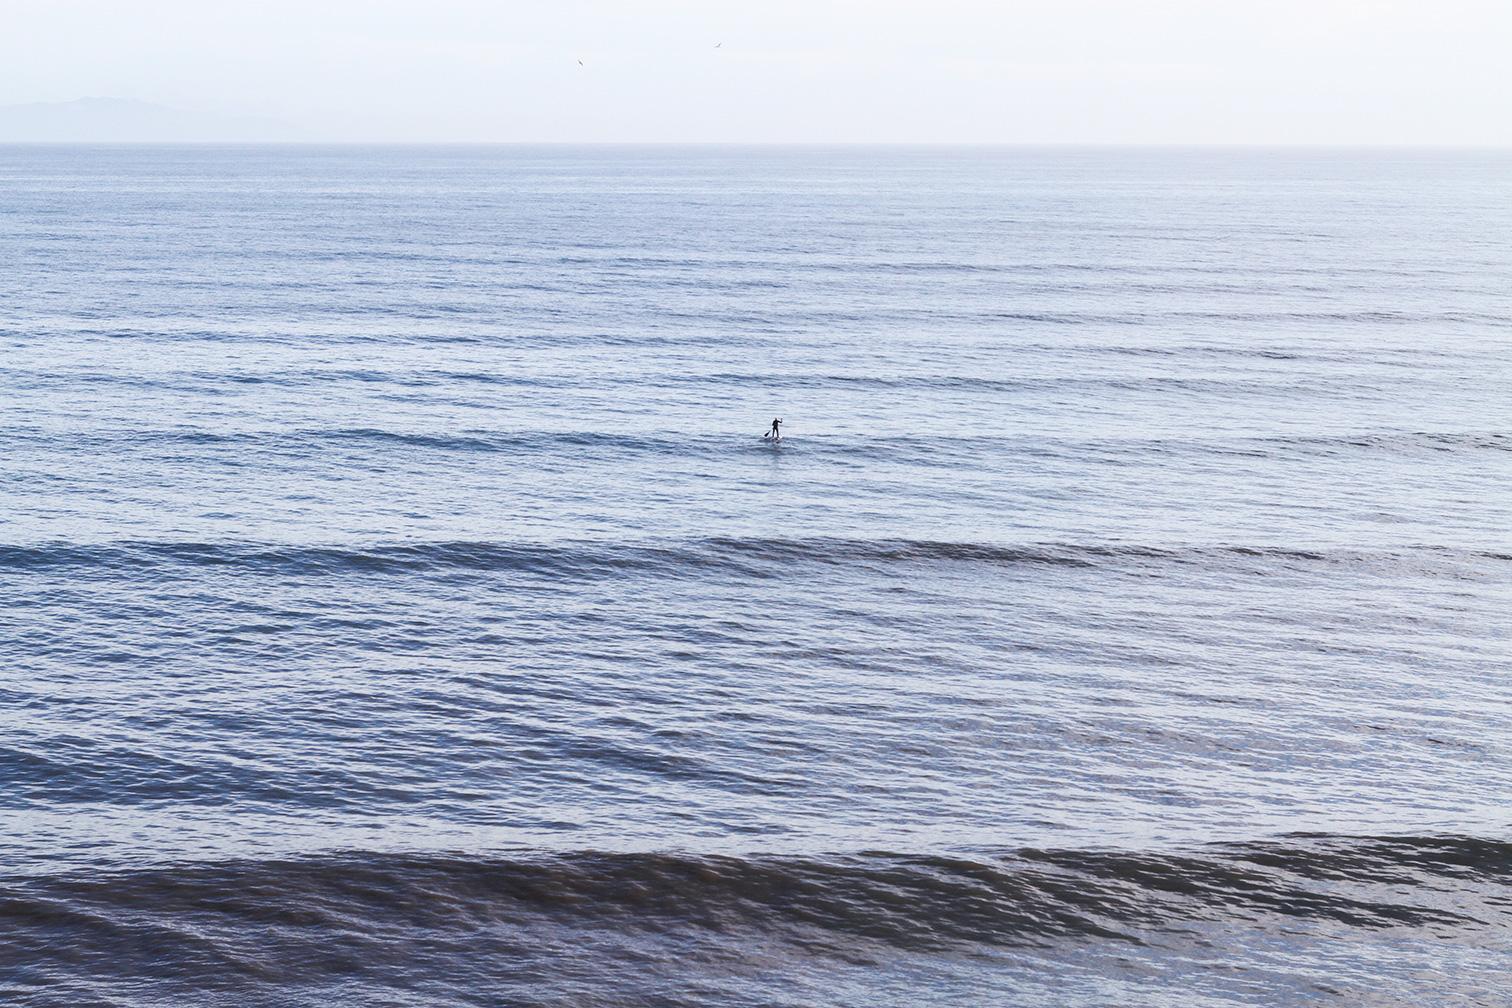 Surfers-Overlook-Photo-by-Halley-Roberts.jpg